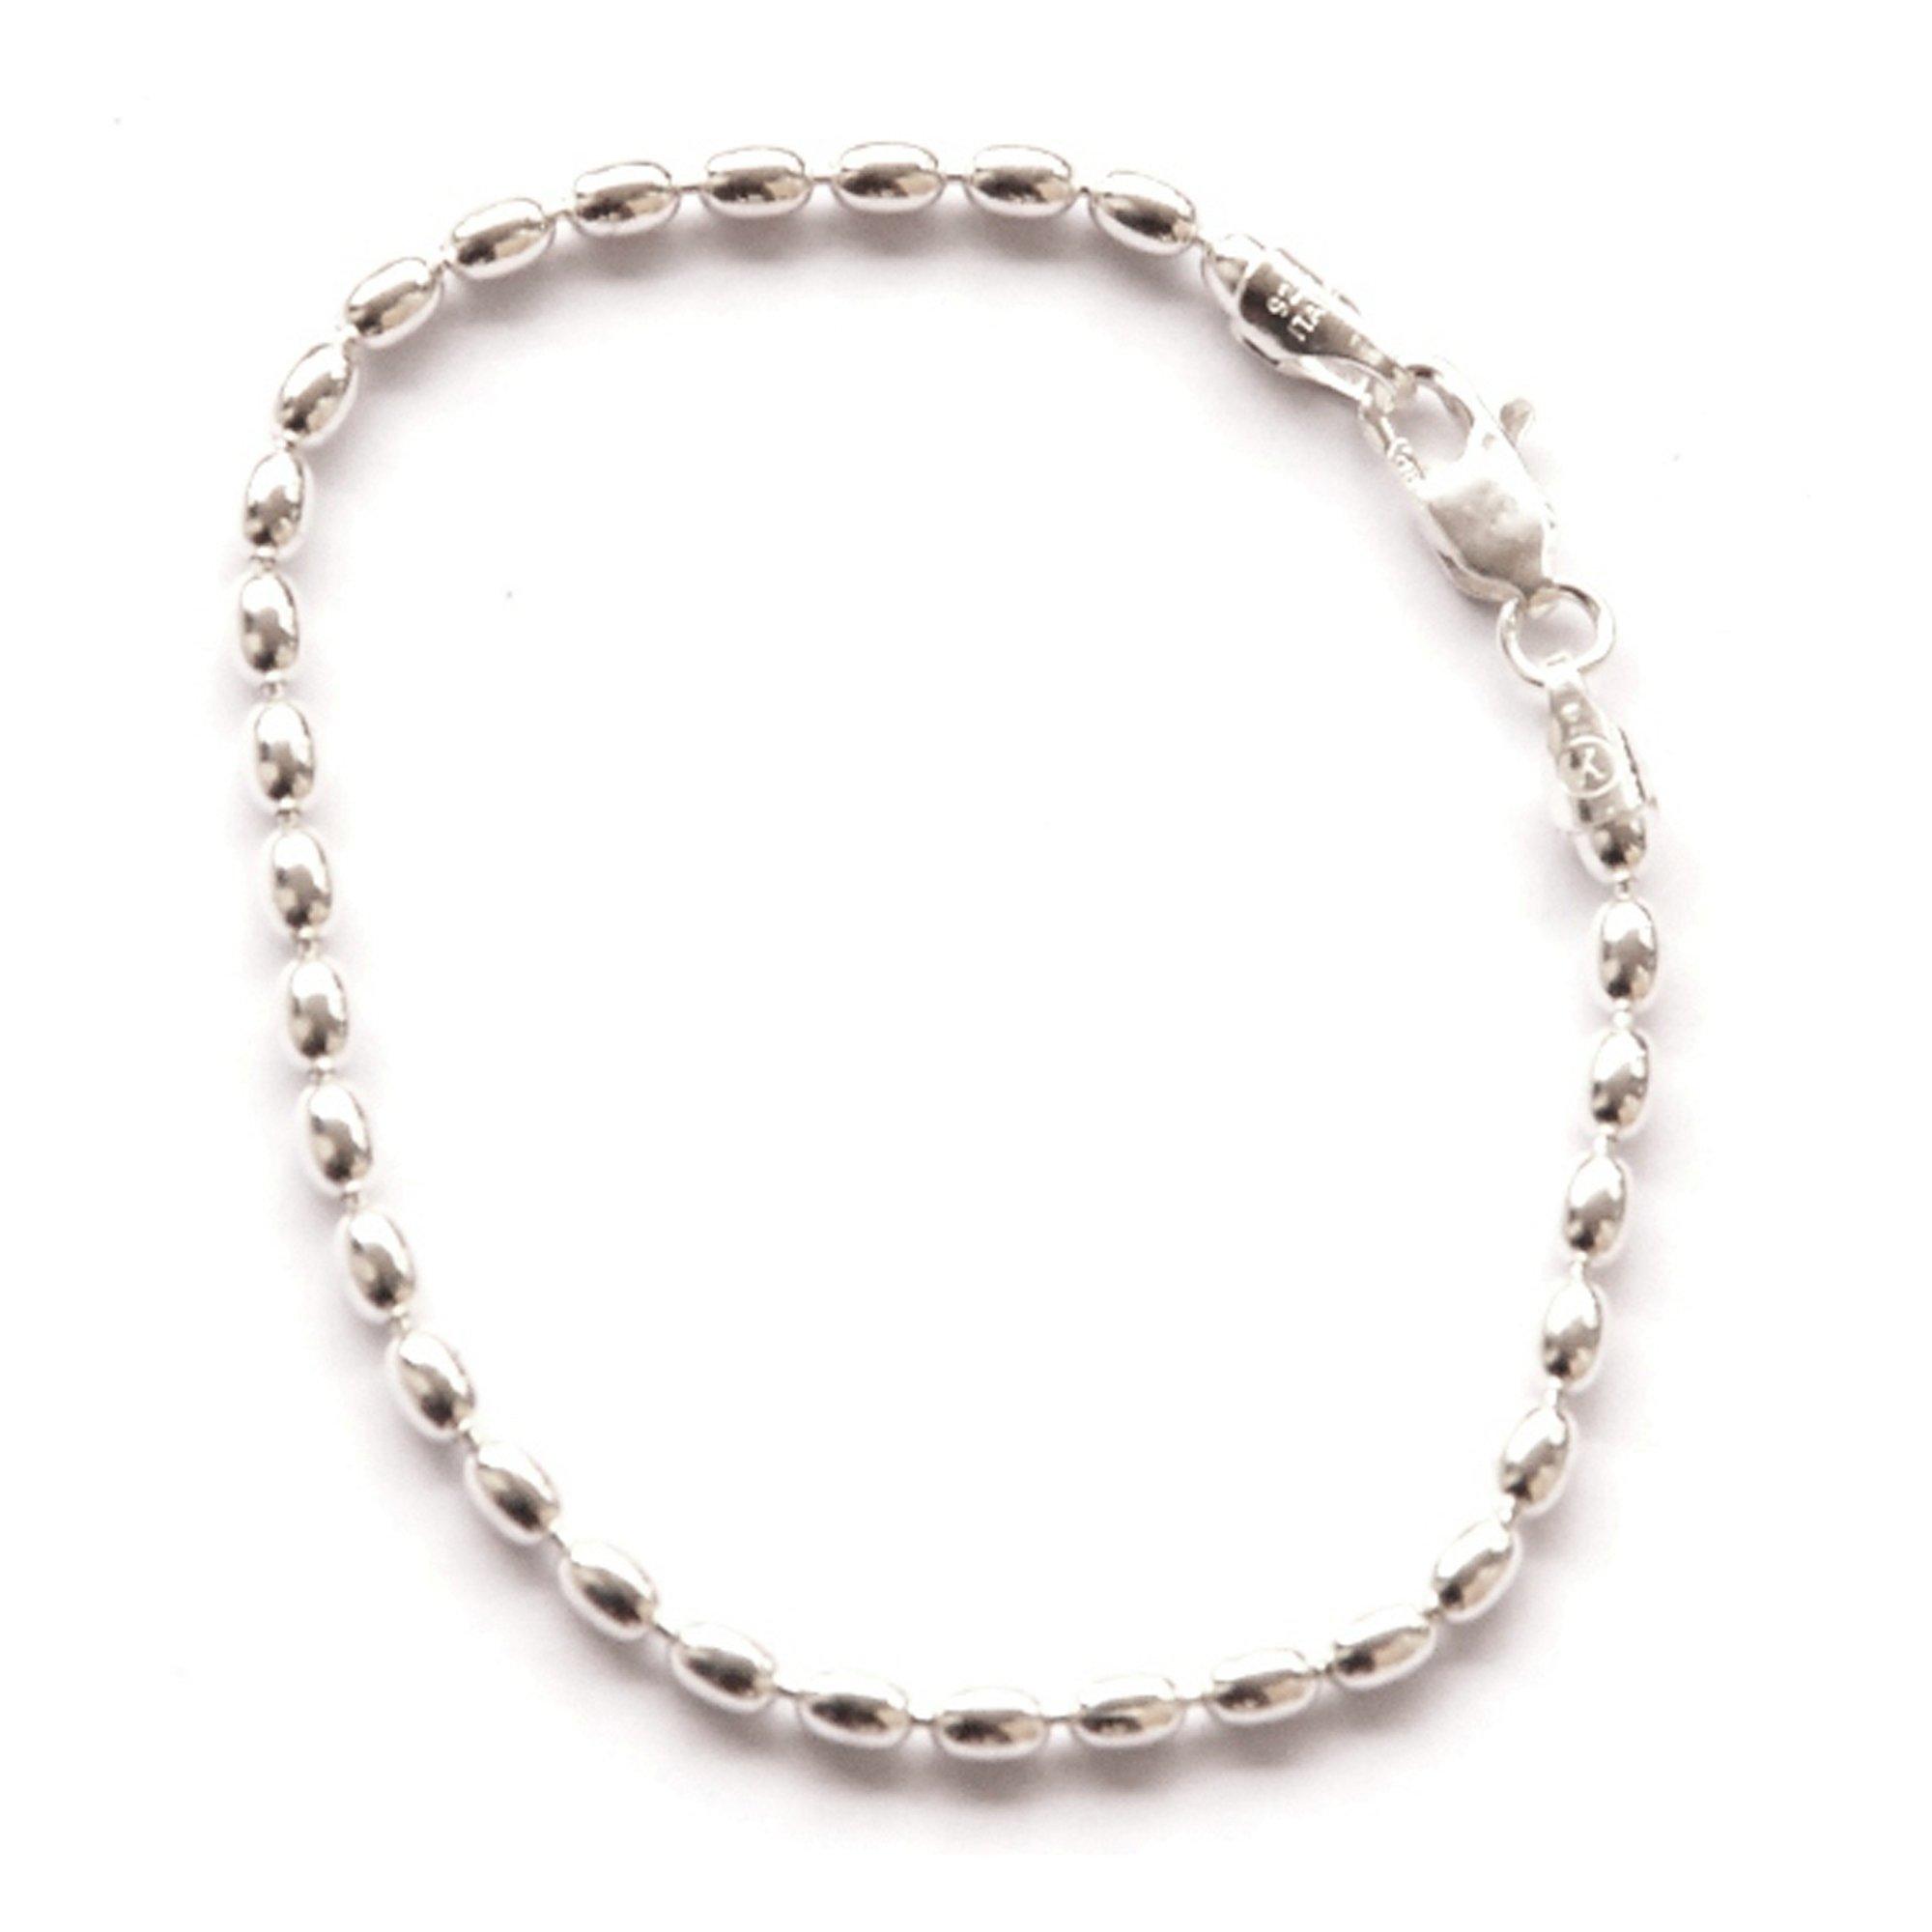 Small St. Silver 6.5-inch Charleston Rice Beads Link Bracelet For Girls & Petit Women Sturdy 2.5 x 3 MMS